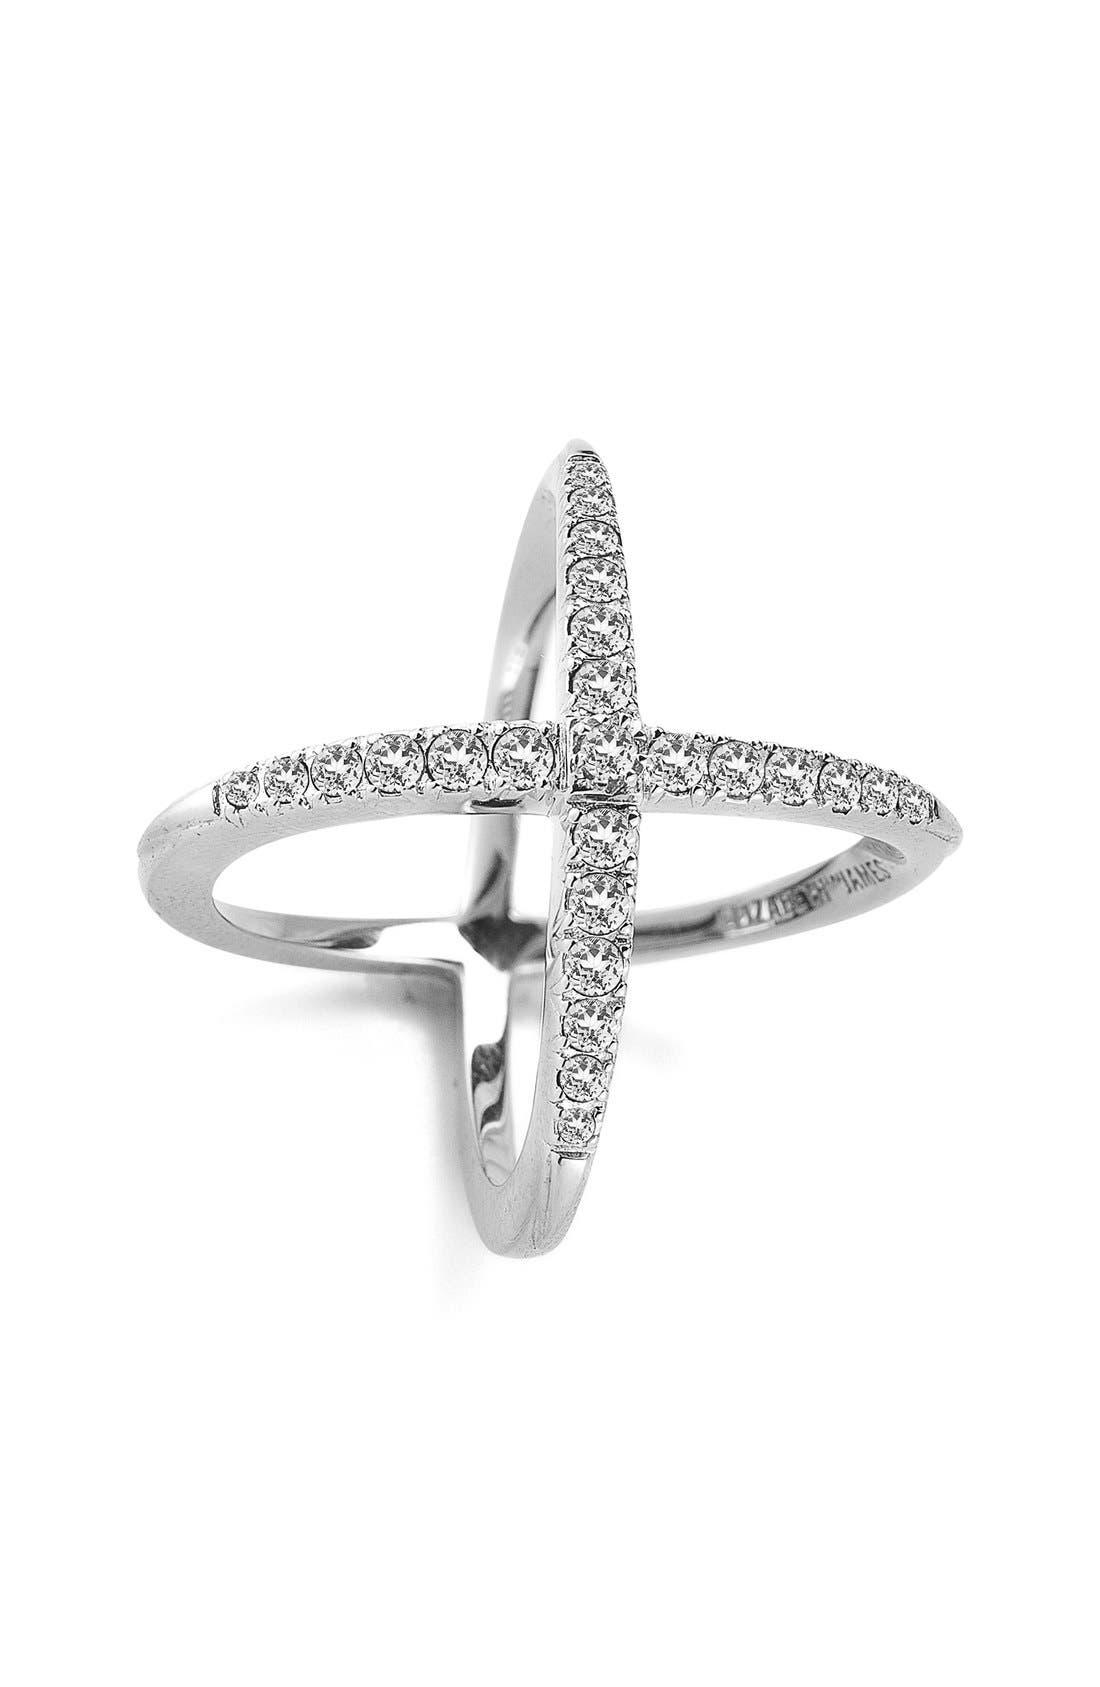 'Windrose' Pavé White Topaz Ring,                         Main,                         color, White Topaz/ Silver